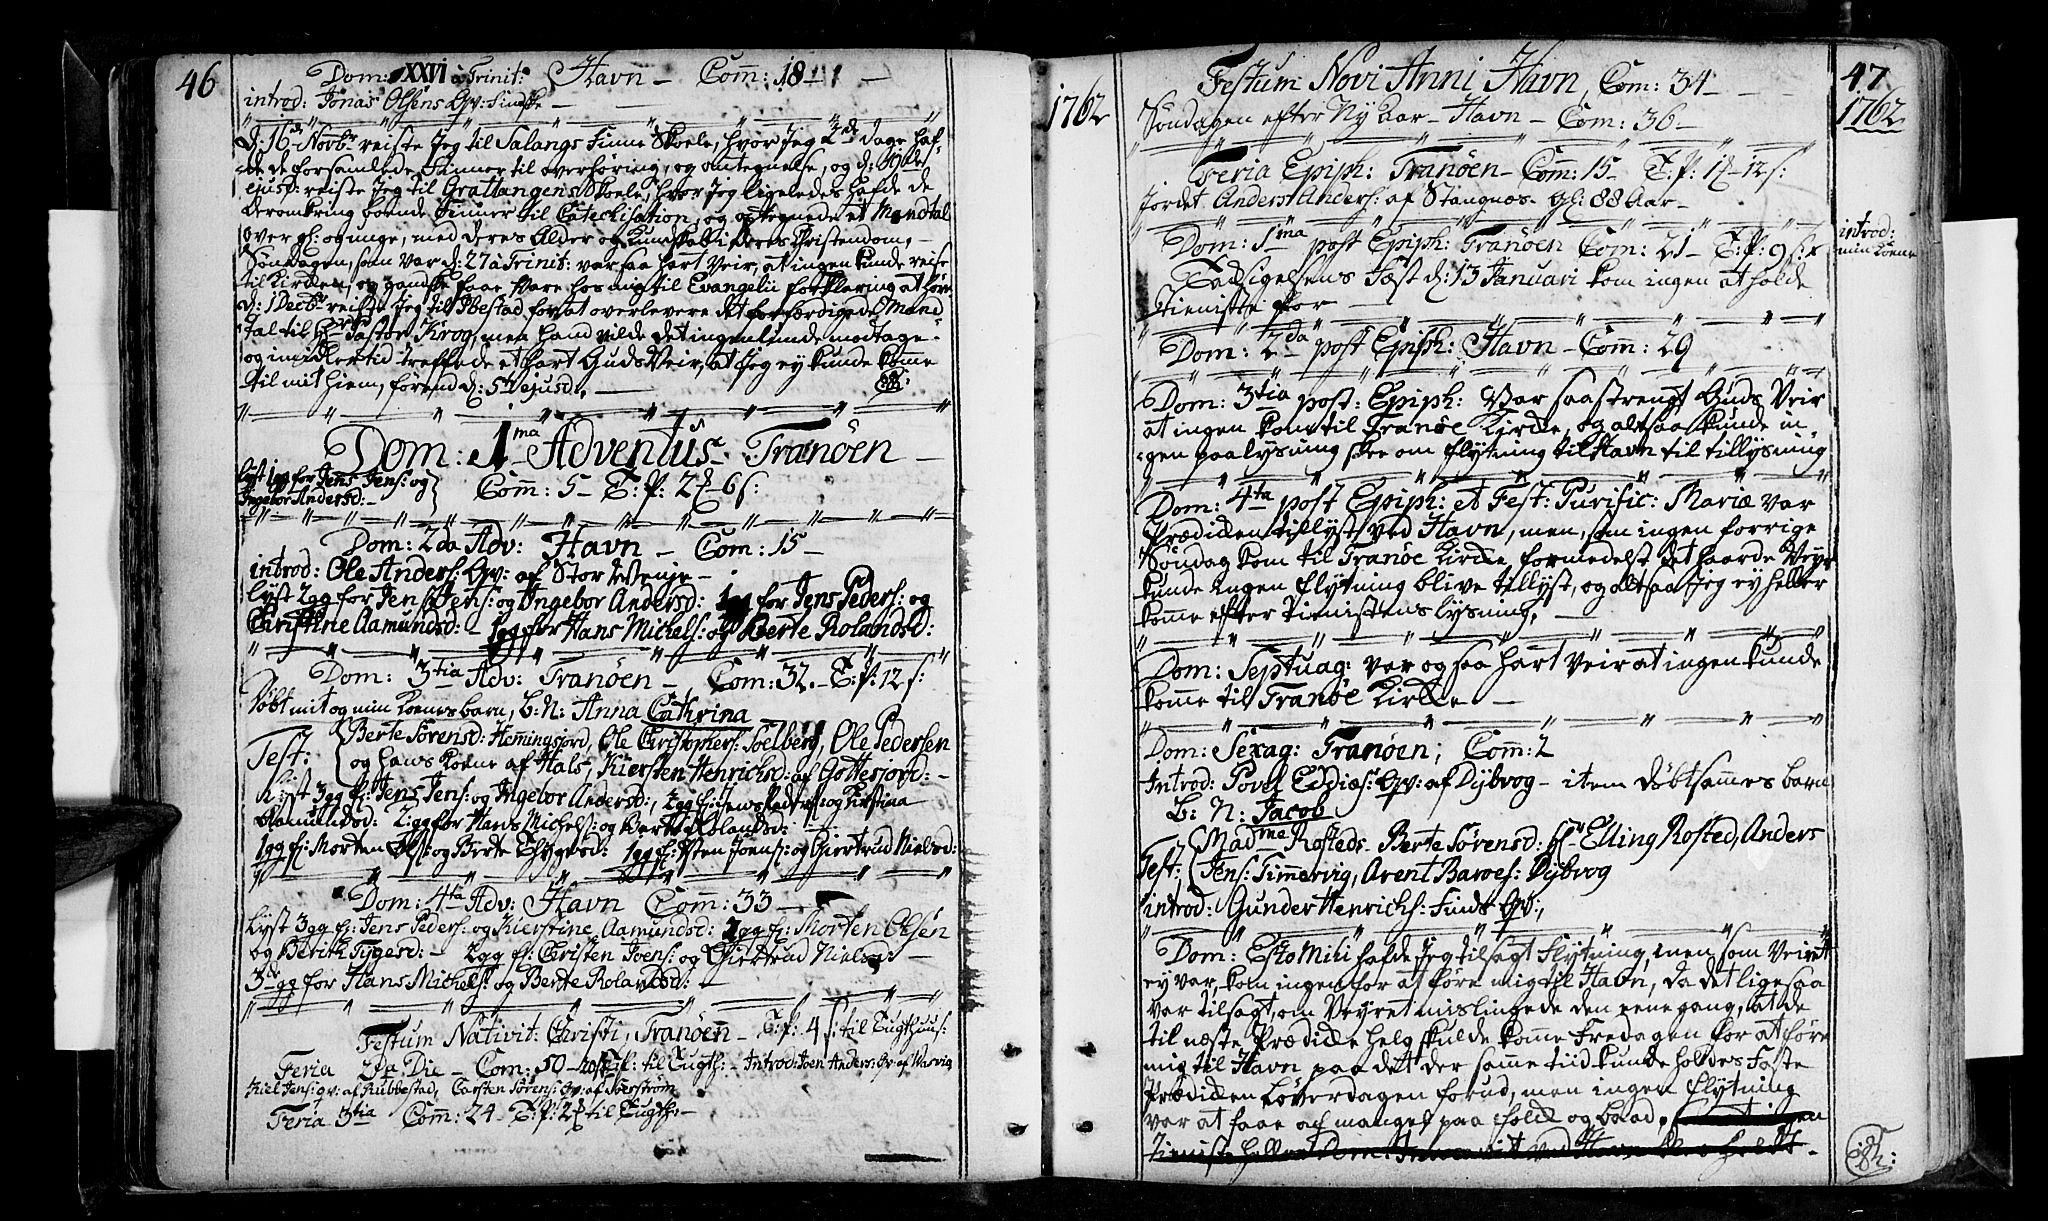 SATØ, Tranøy sokneprestkontor, I/Ia/Iaa/L0001kirke: Ministerialbok nr. 1, 1757-1773, s. 46-47